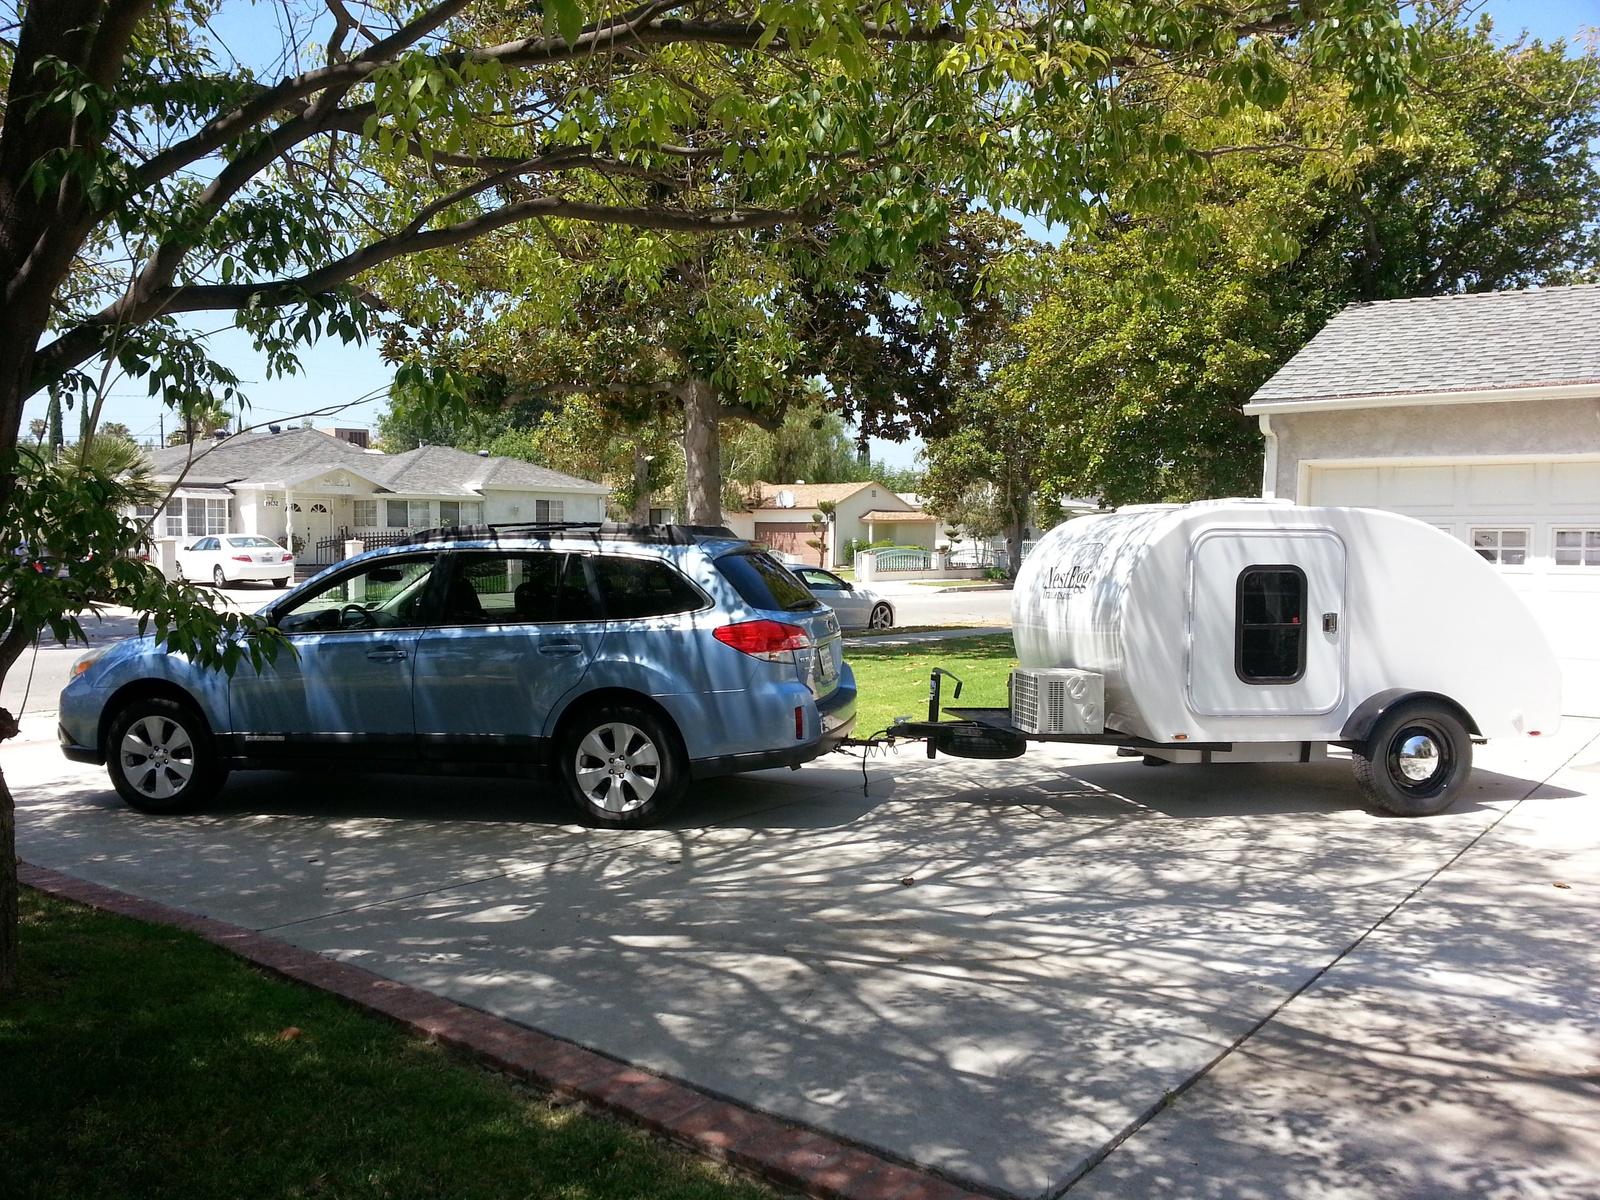 20122016 Honda Crv Crv Trailer Hitch Wiring Kit Ballmount Ball